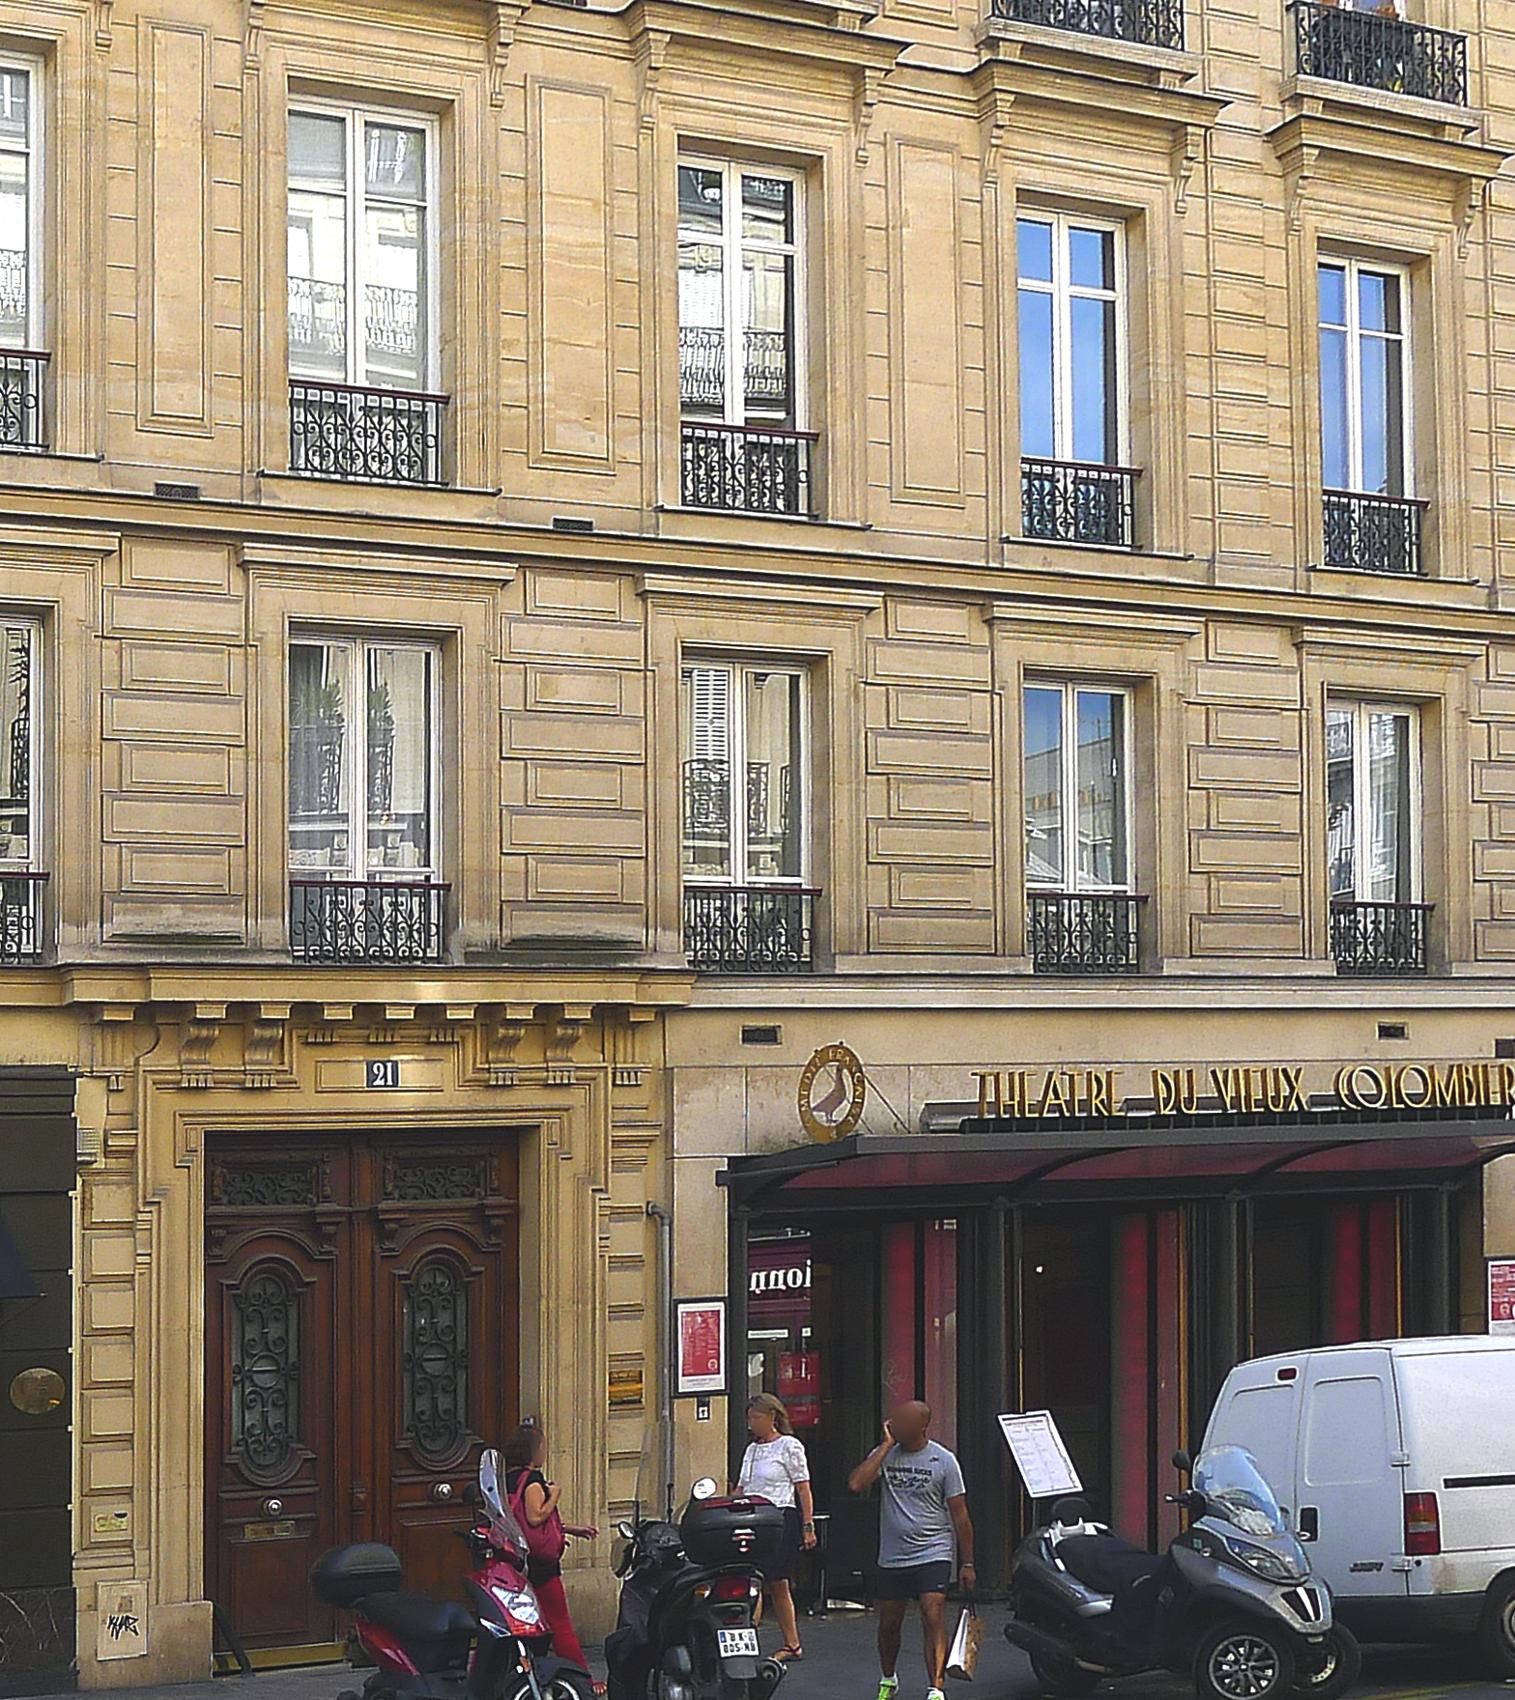 https://upload.wikimedia.org/wikipedia/commons/8/8b/P1130332_Paris_VI_rue_du_Vieux-Colombier_n%C2%B021_Th%C3%A9%C3%A2tre_du_Vieux-Colombier_rwk.JPG